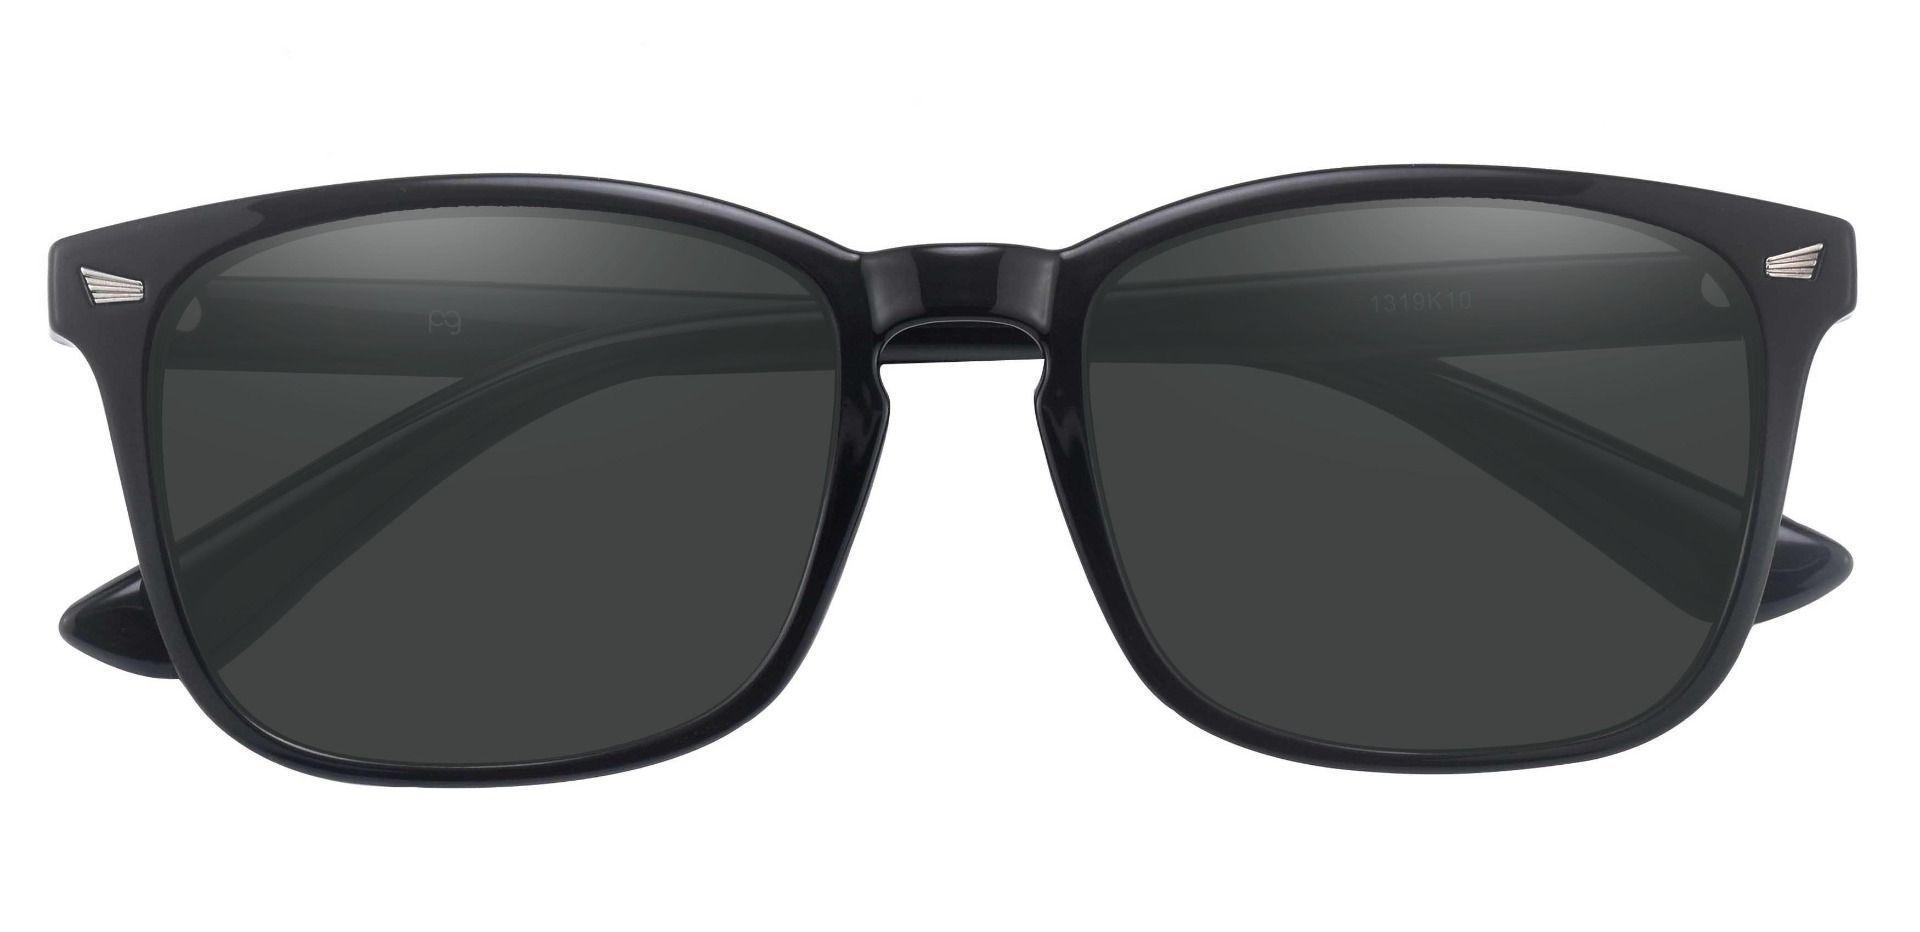 Rogan Square Prescription Sunglasses - Black Frame With Gray Lenses